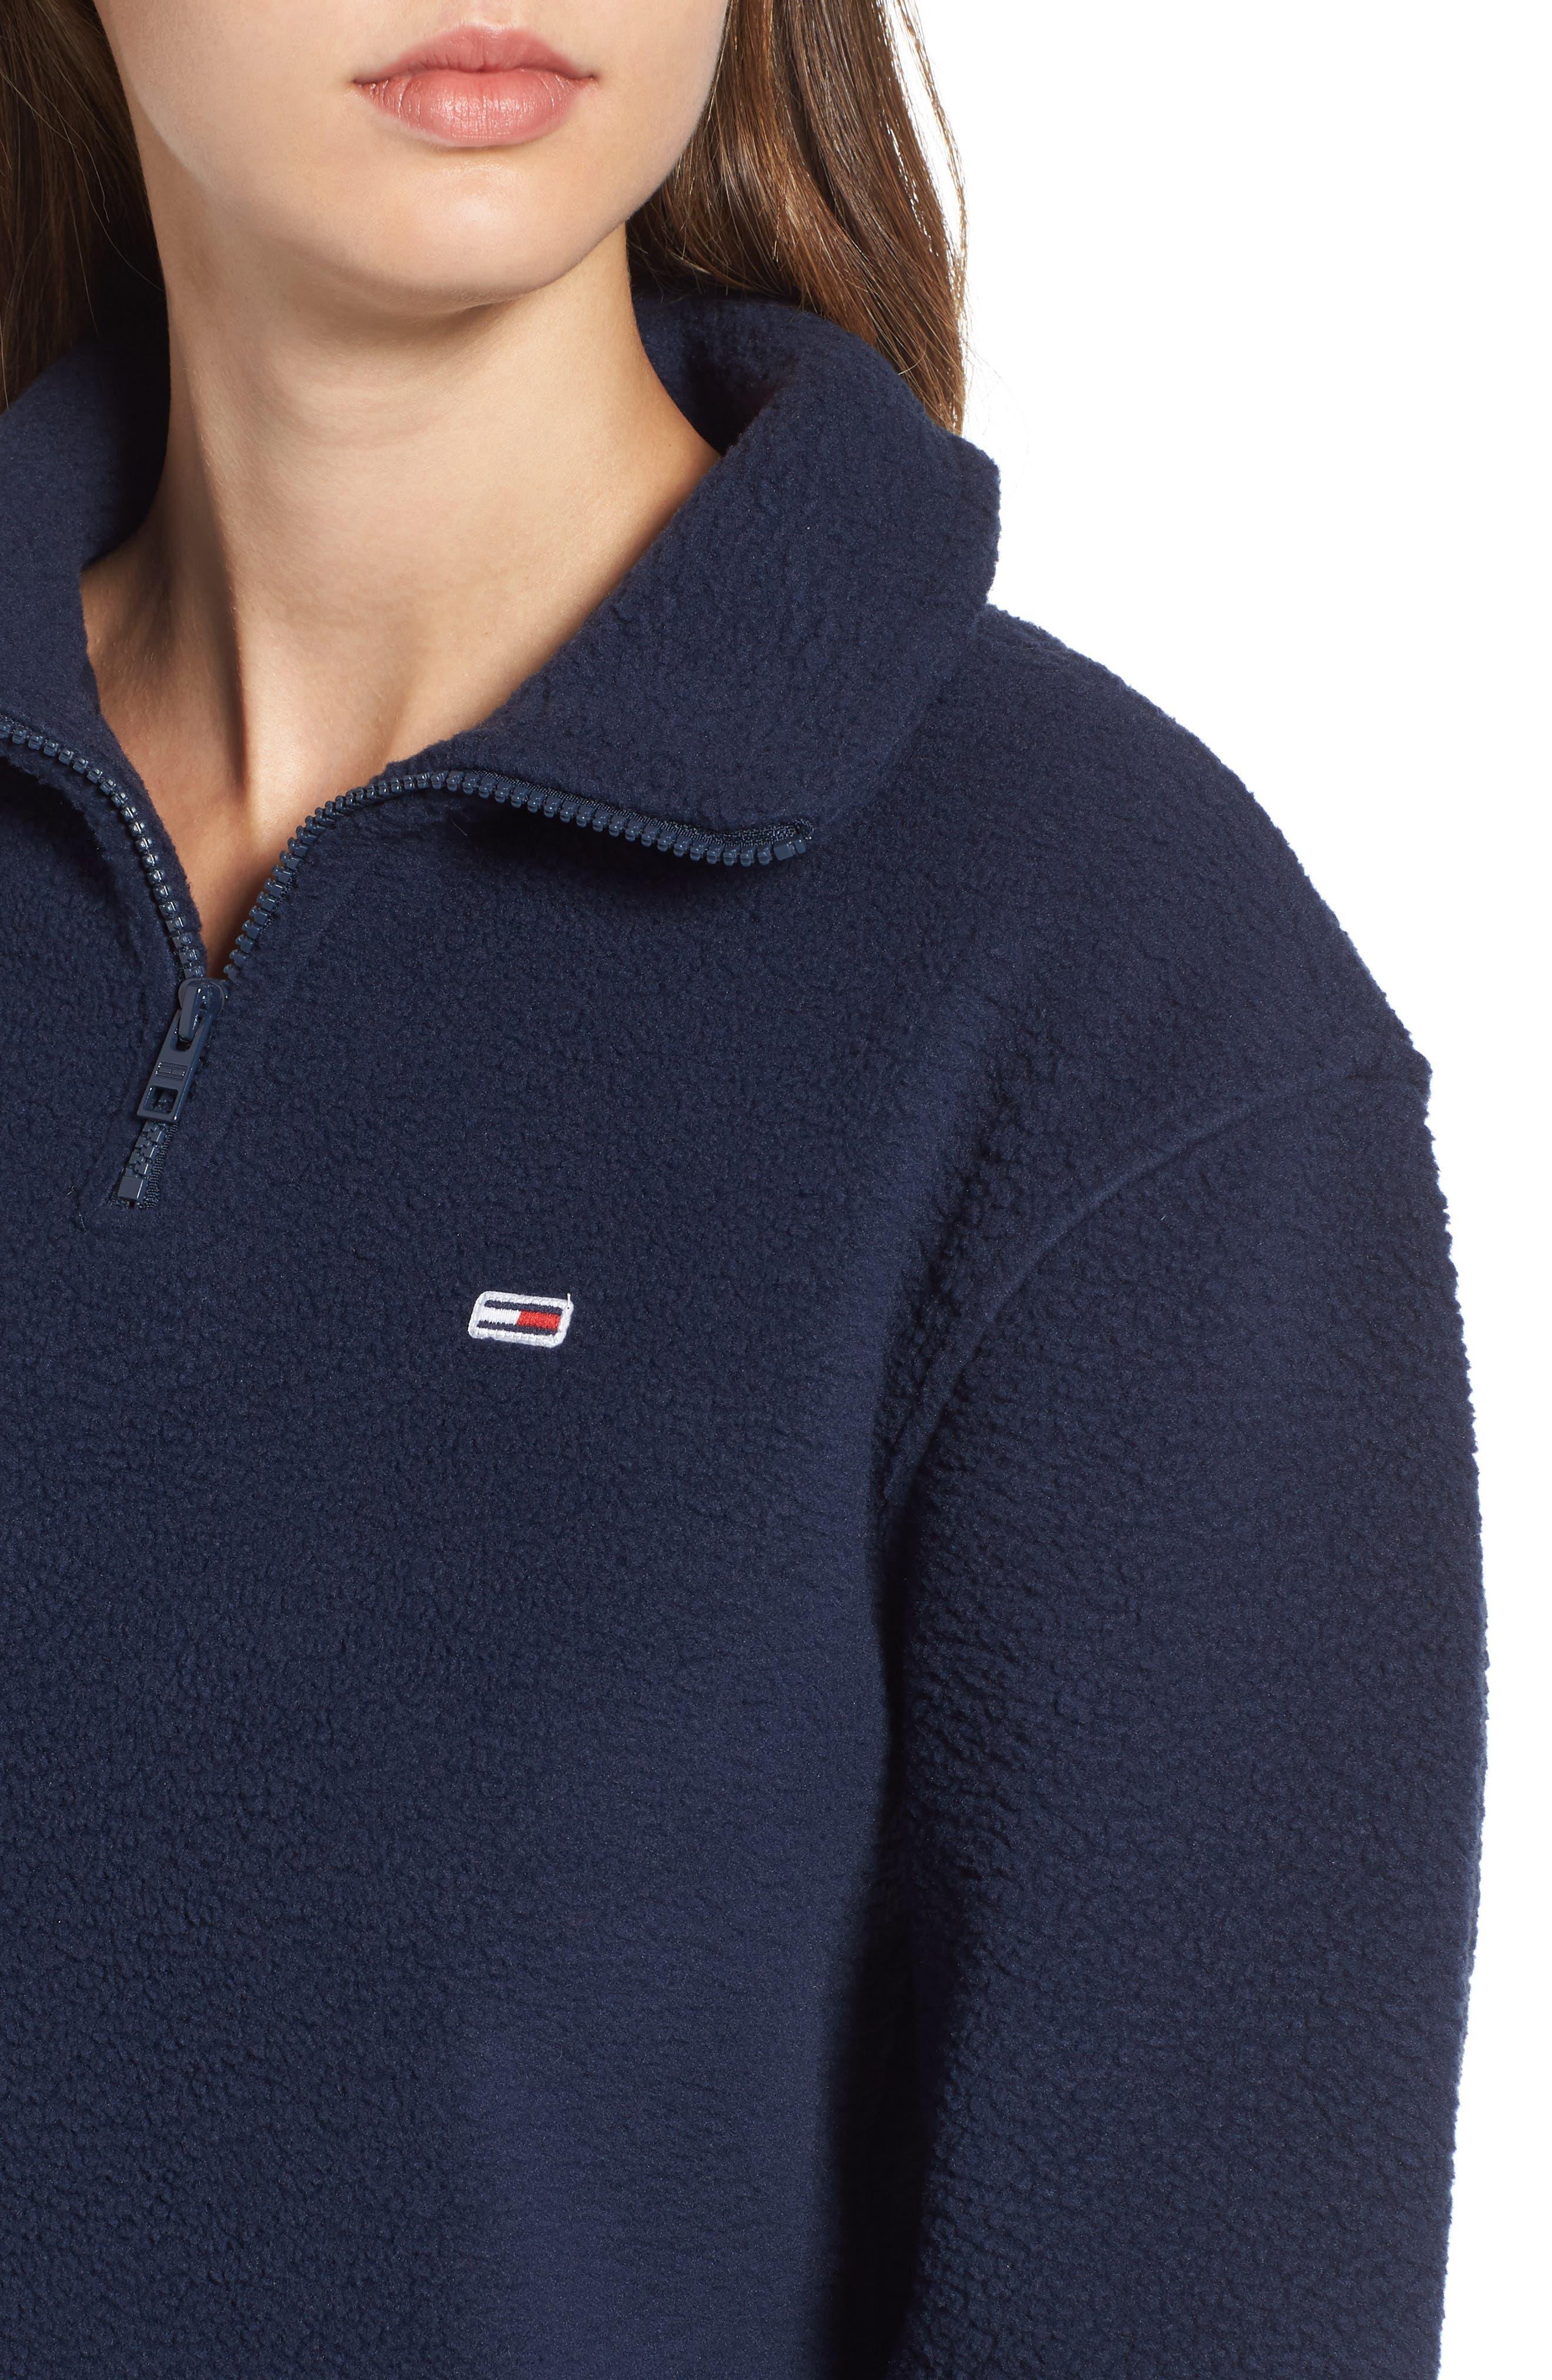 TJW Classics Polar Fleece Sweatshirt,                             Alternate thumbnail 4, color,                             002